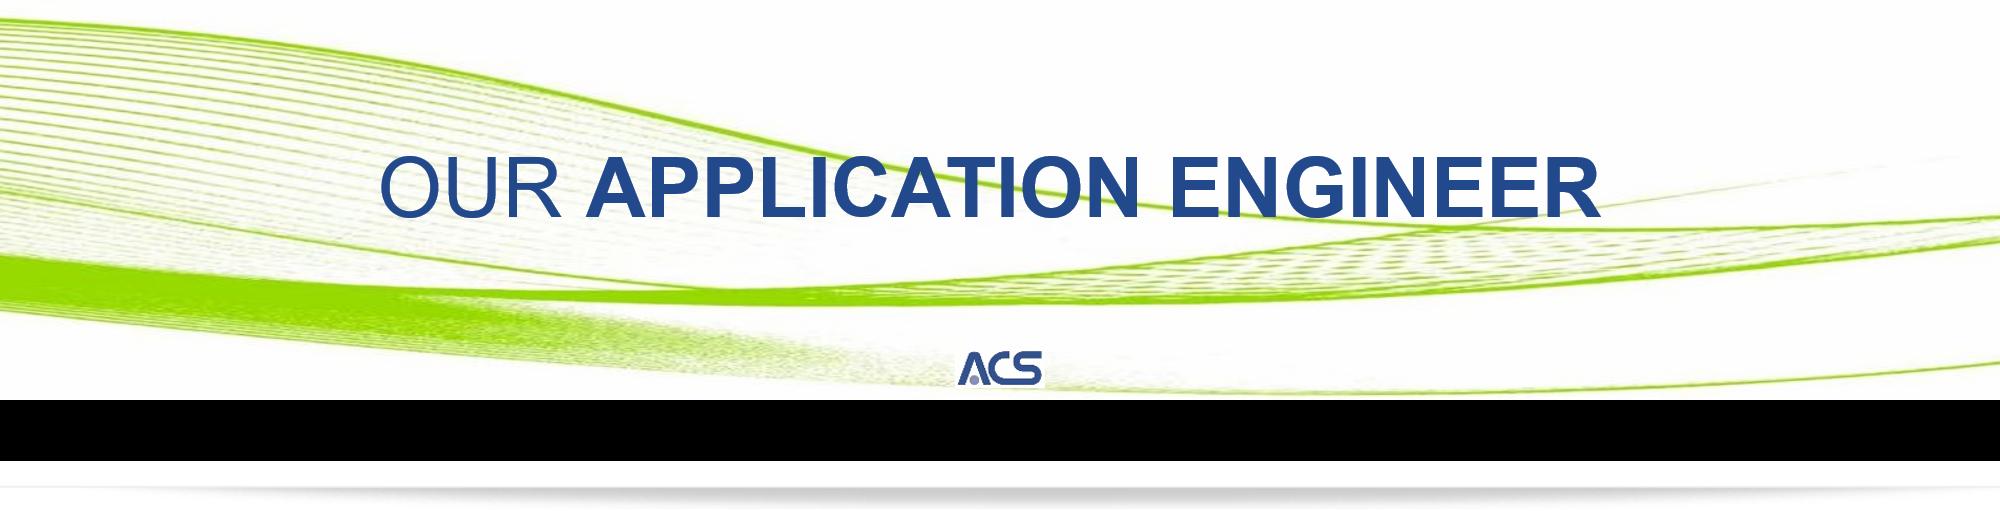 EN_Our Application Engineer